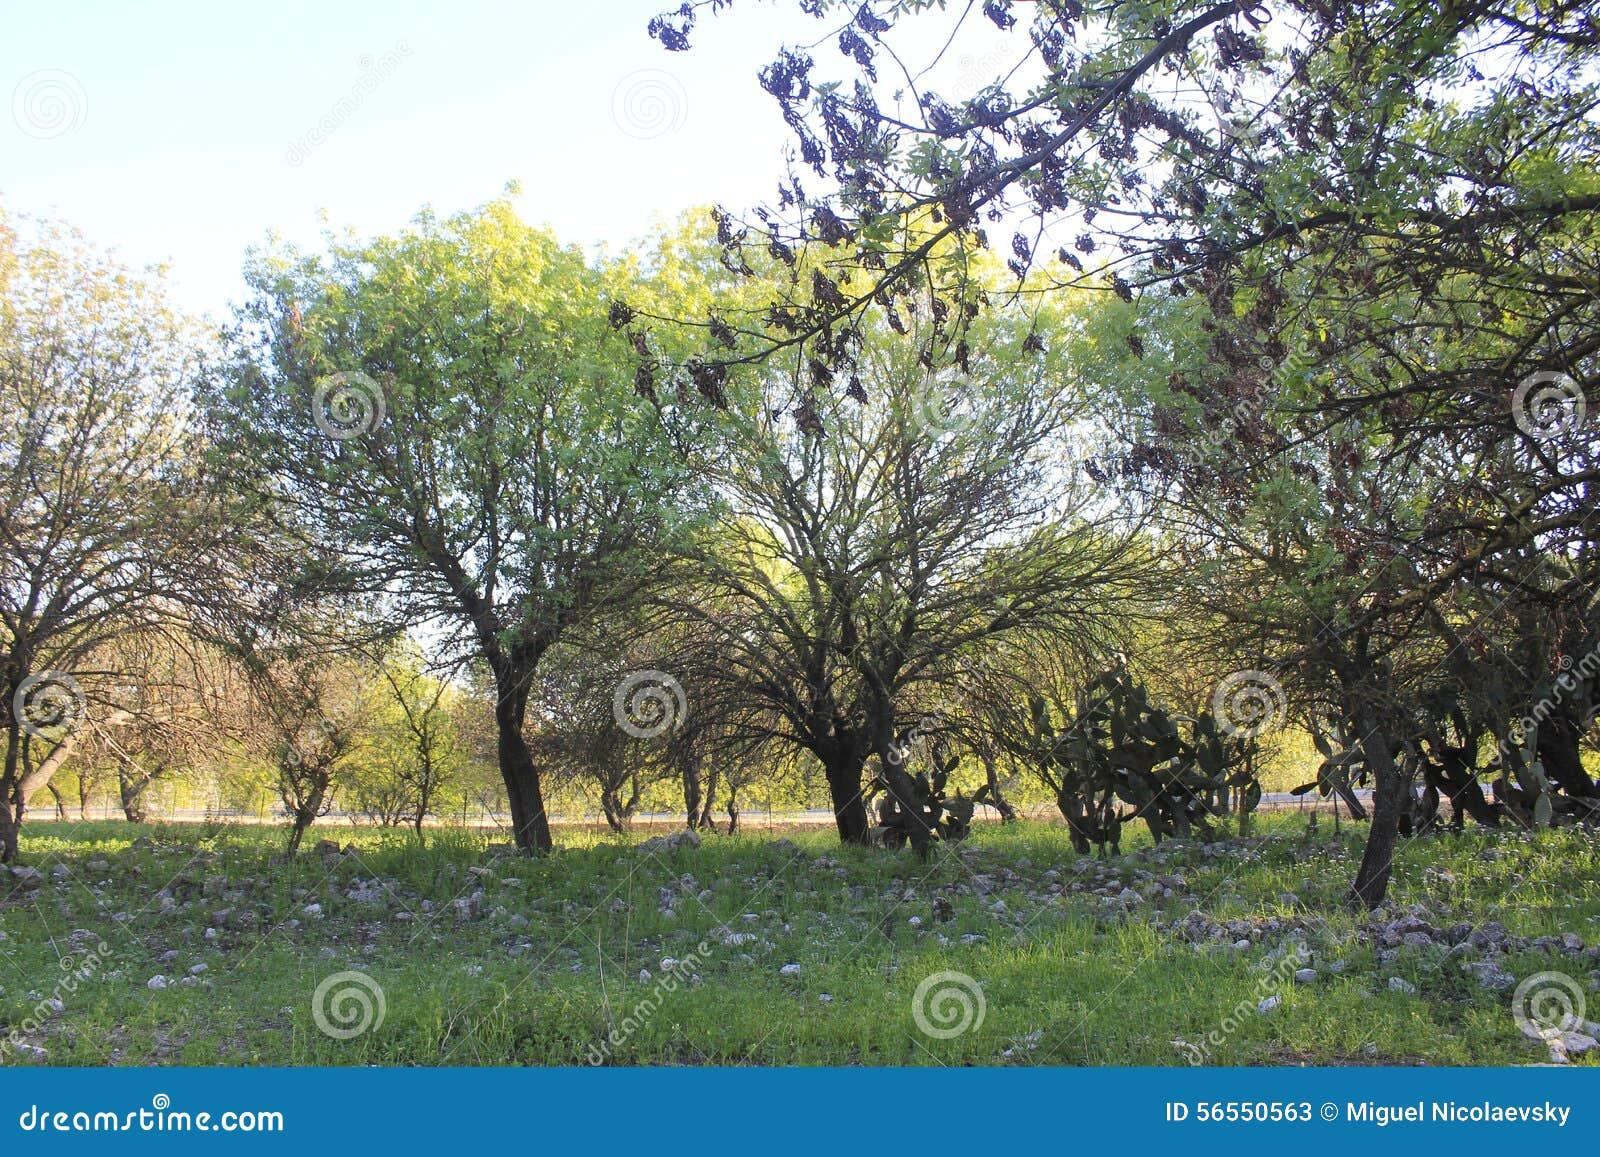 Download Δέντρα στις καταστροφές της αρχαίας πόλης βιβλικού Kedesh στο Ισραήλ Στοκ Εικόνα - εικόνα από εποχή, οριοθετημένα: 56550563